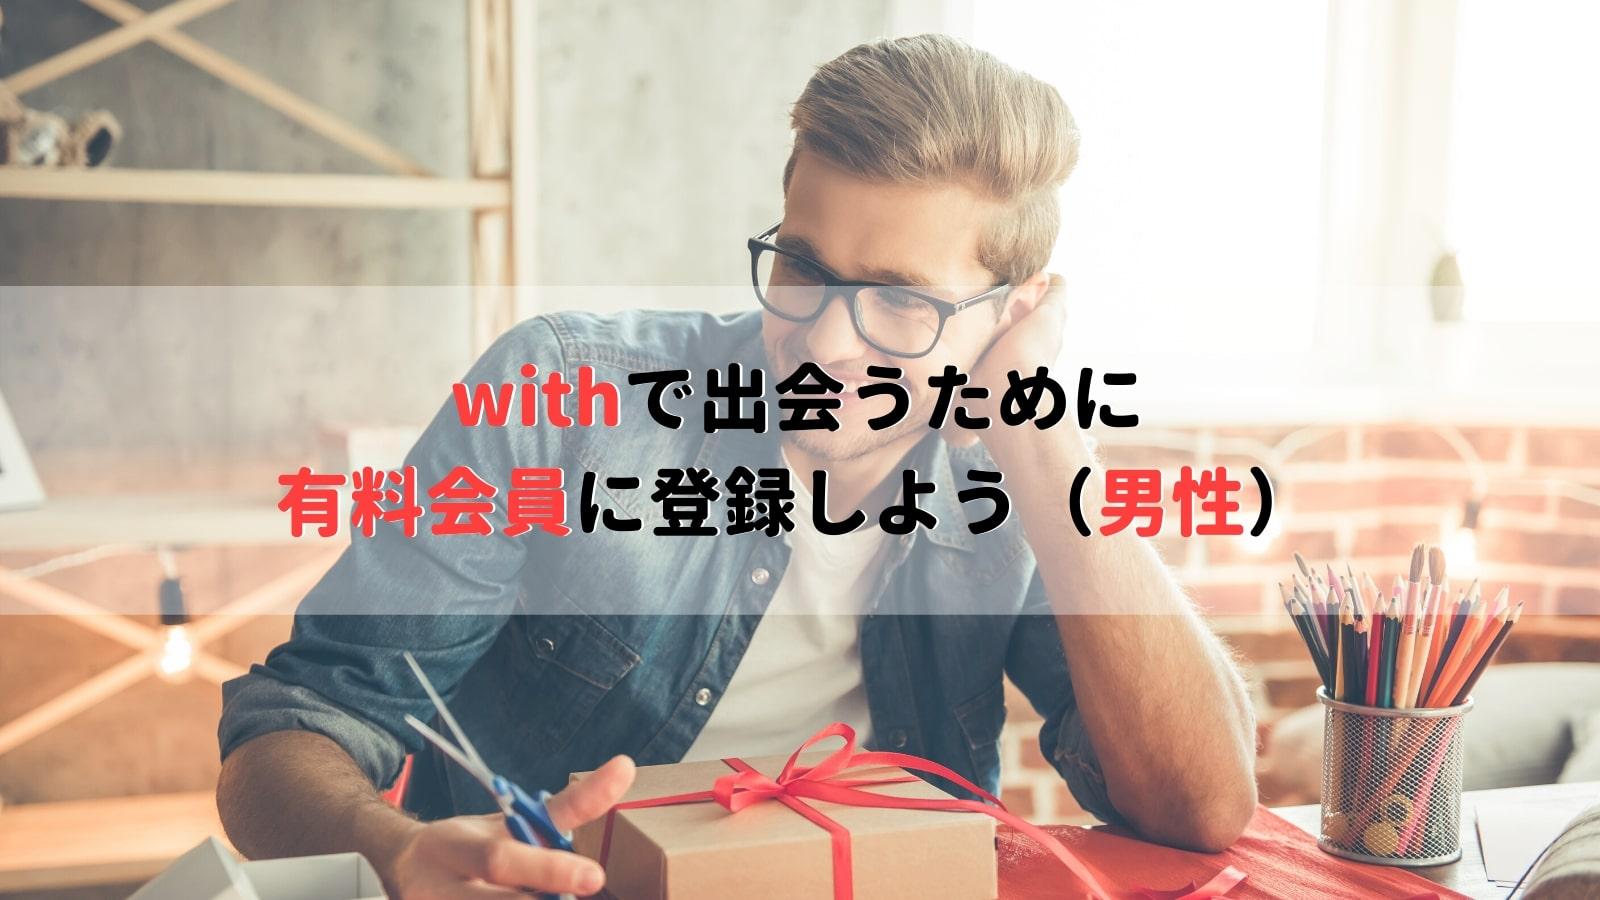 withで出会うために有料会員に登録しよう(男性)